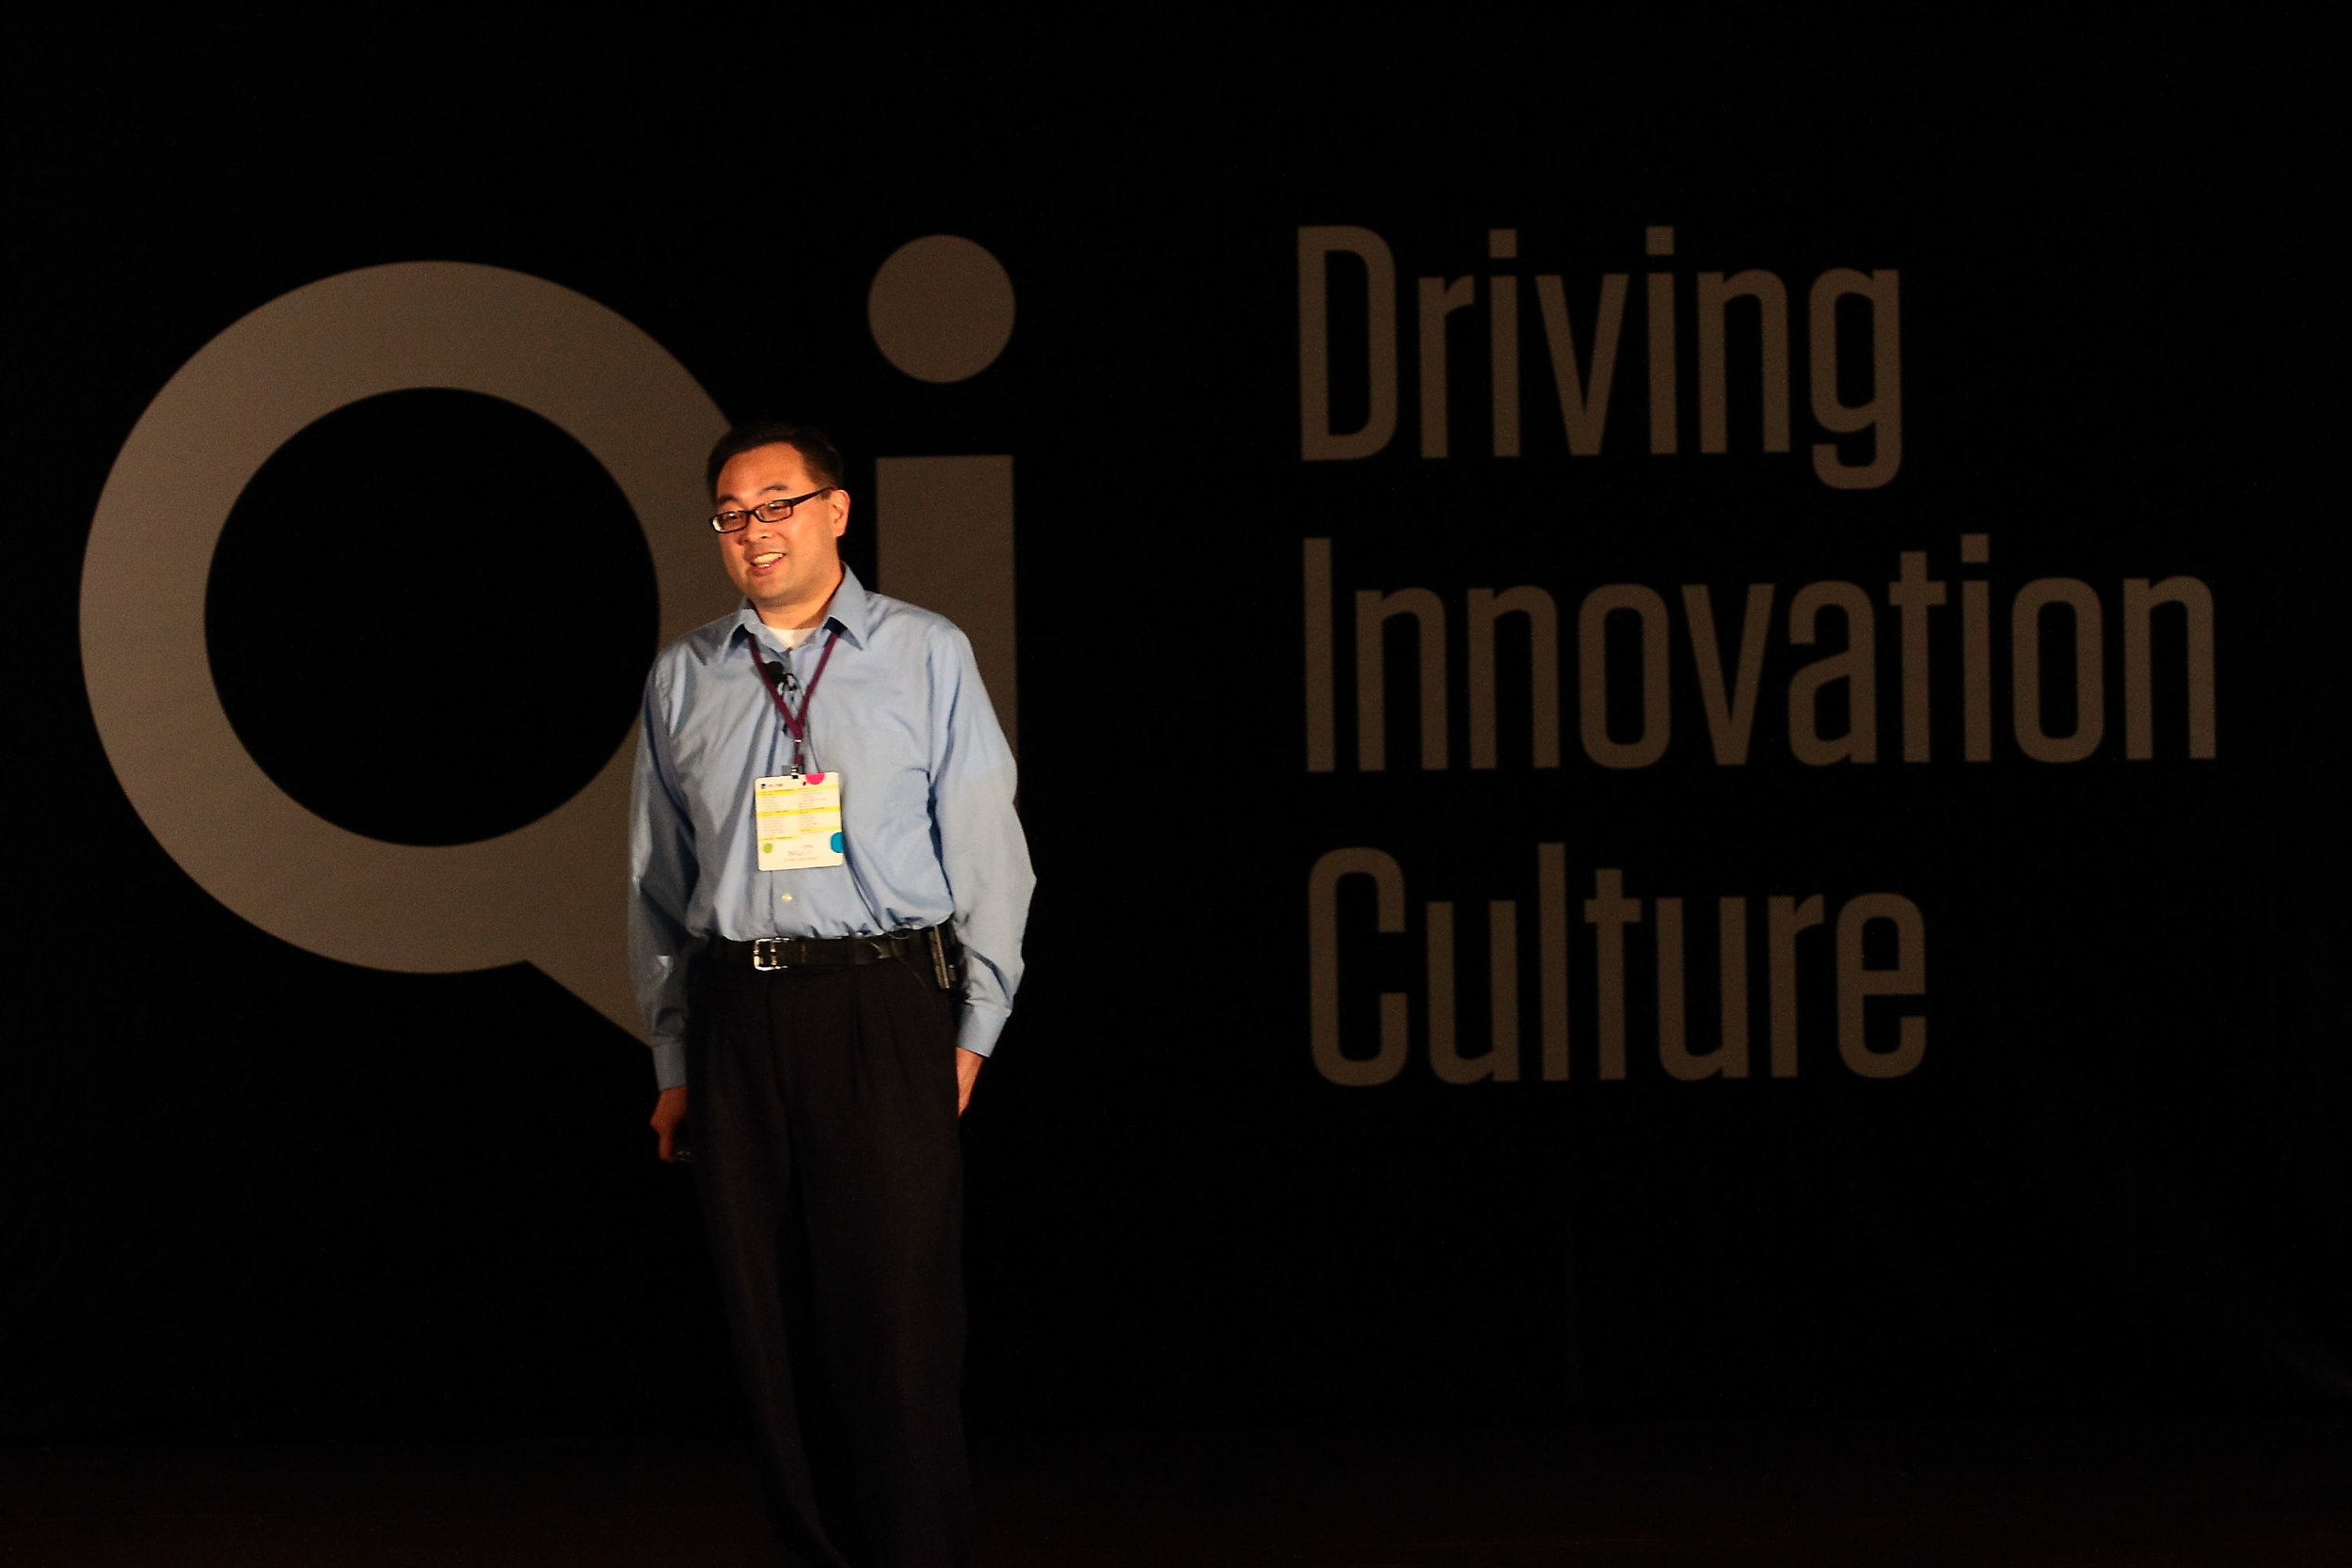 qi-global-2011-driving-innovation-culture-067.jpg